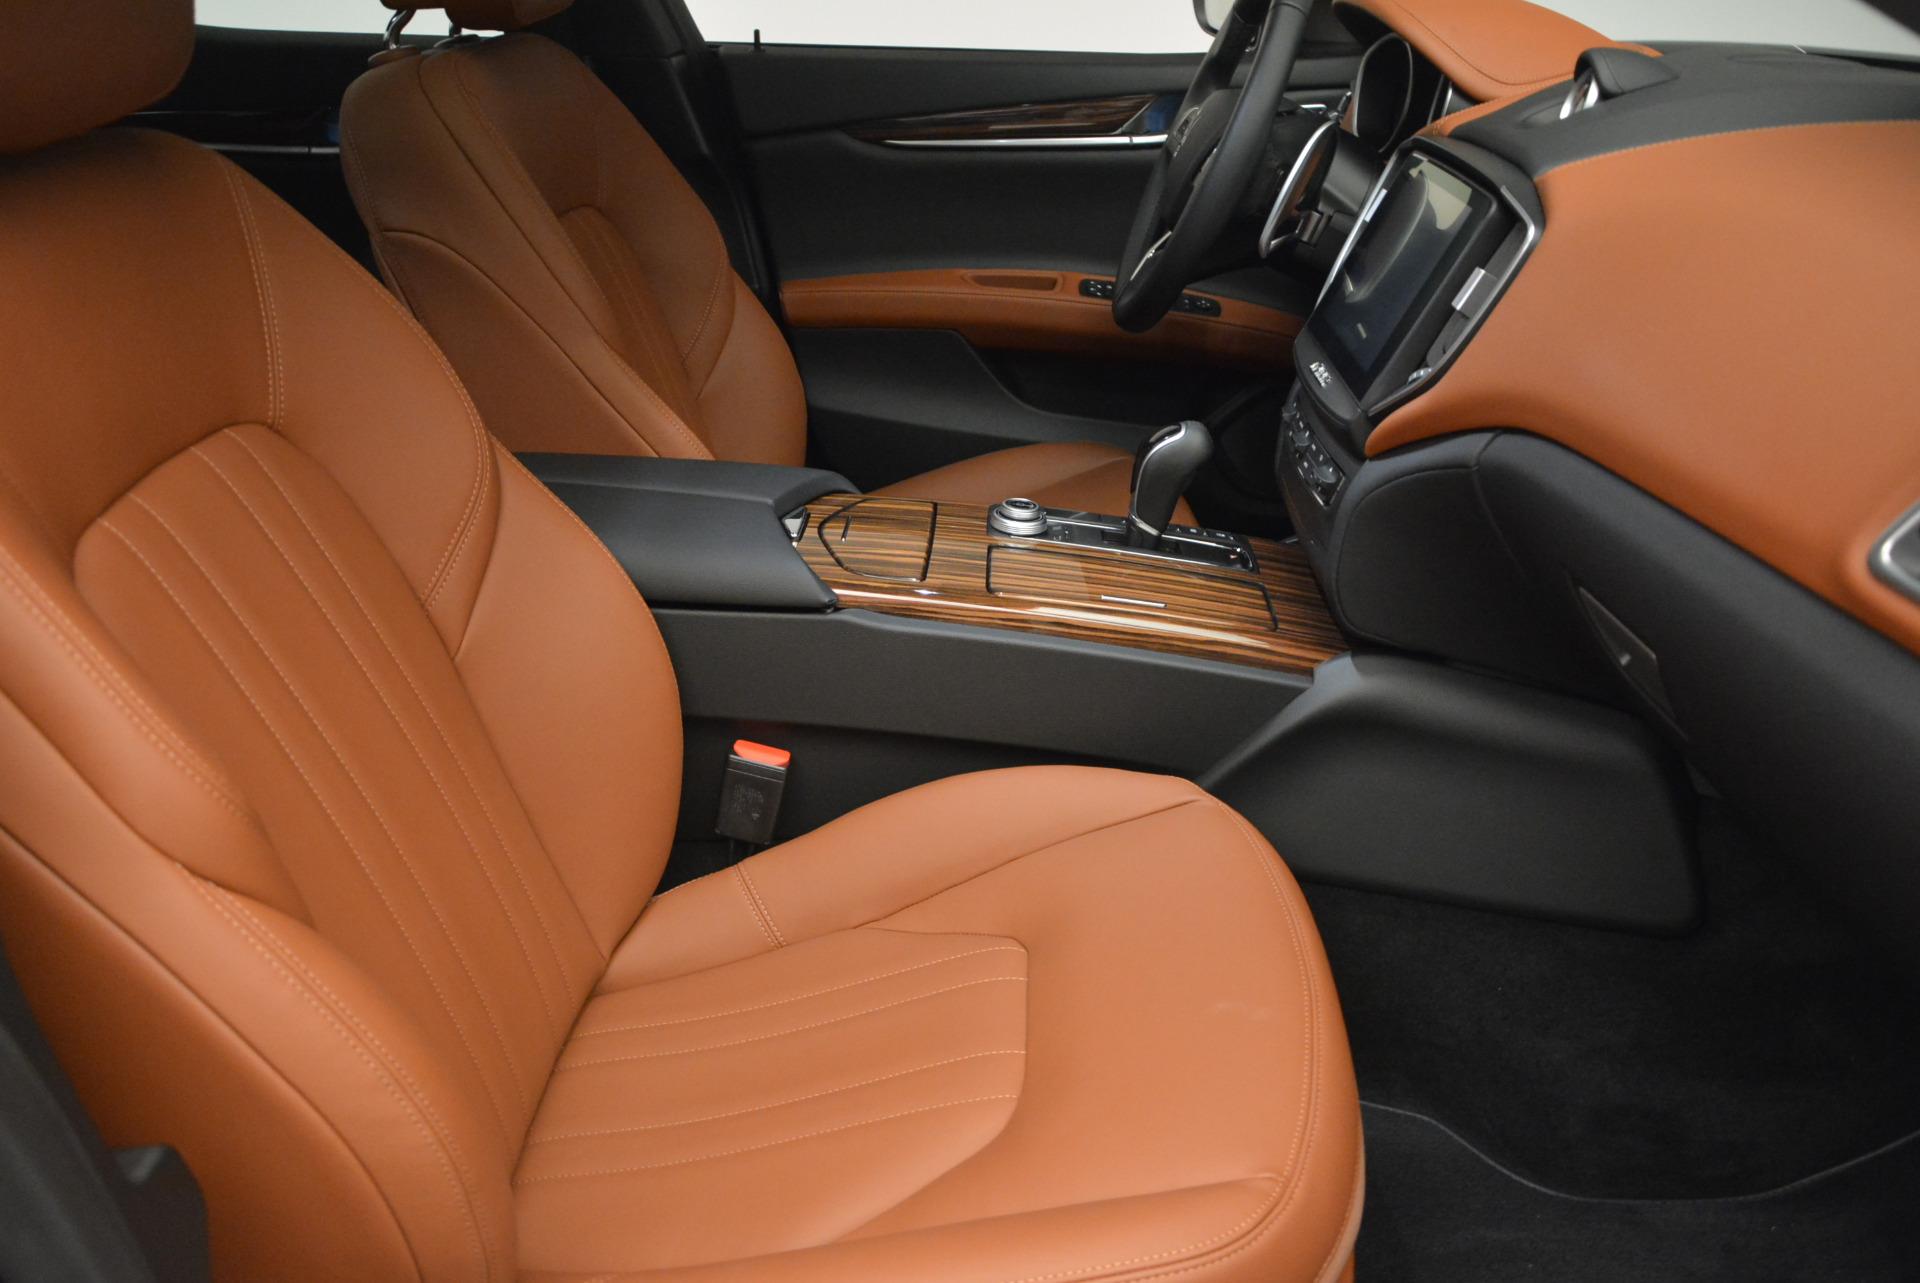 Used 2017 Maserati Ghibli S Q4 - EX Loaner For Sale In Greenwich, CT 567_p20